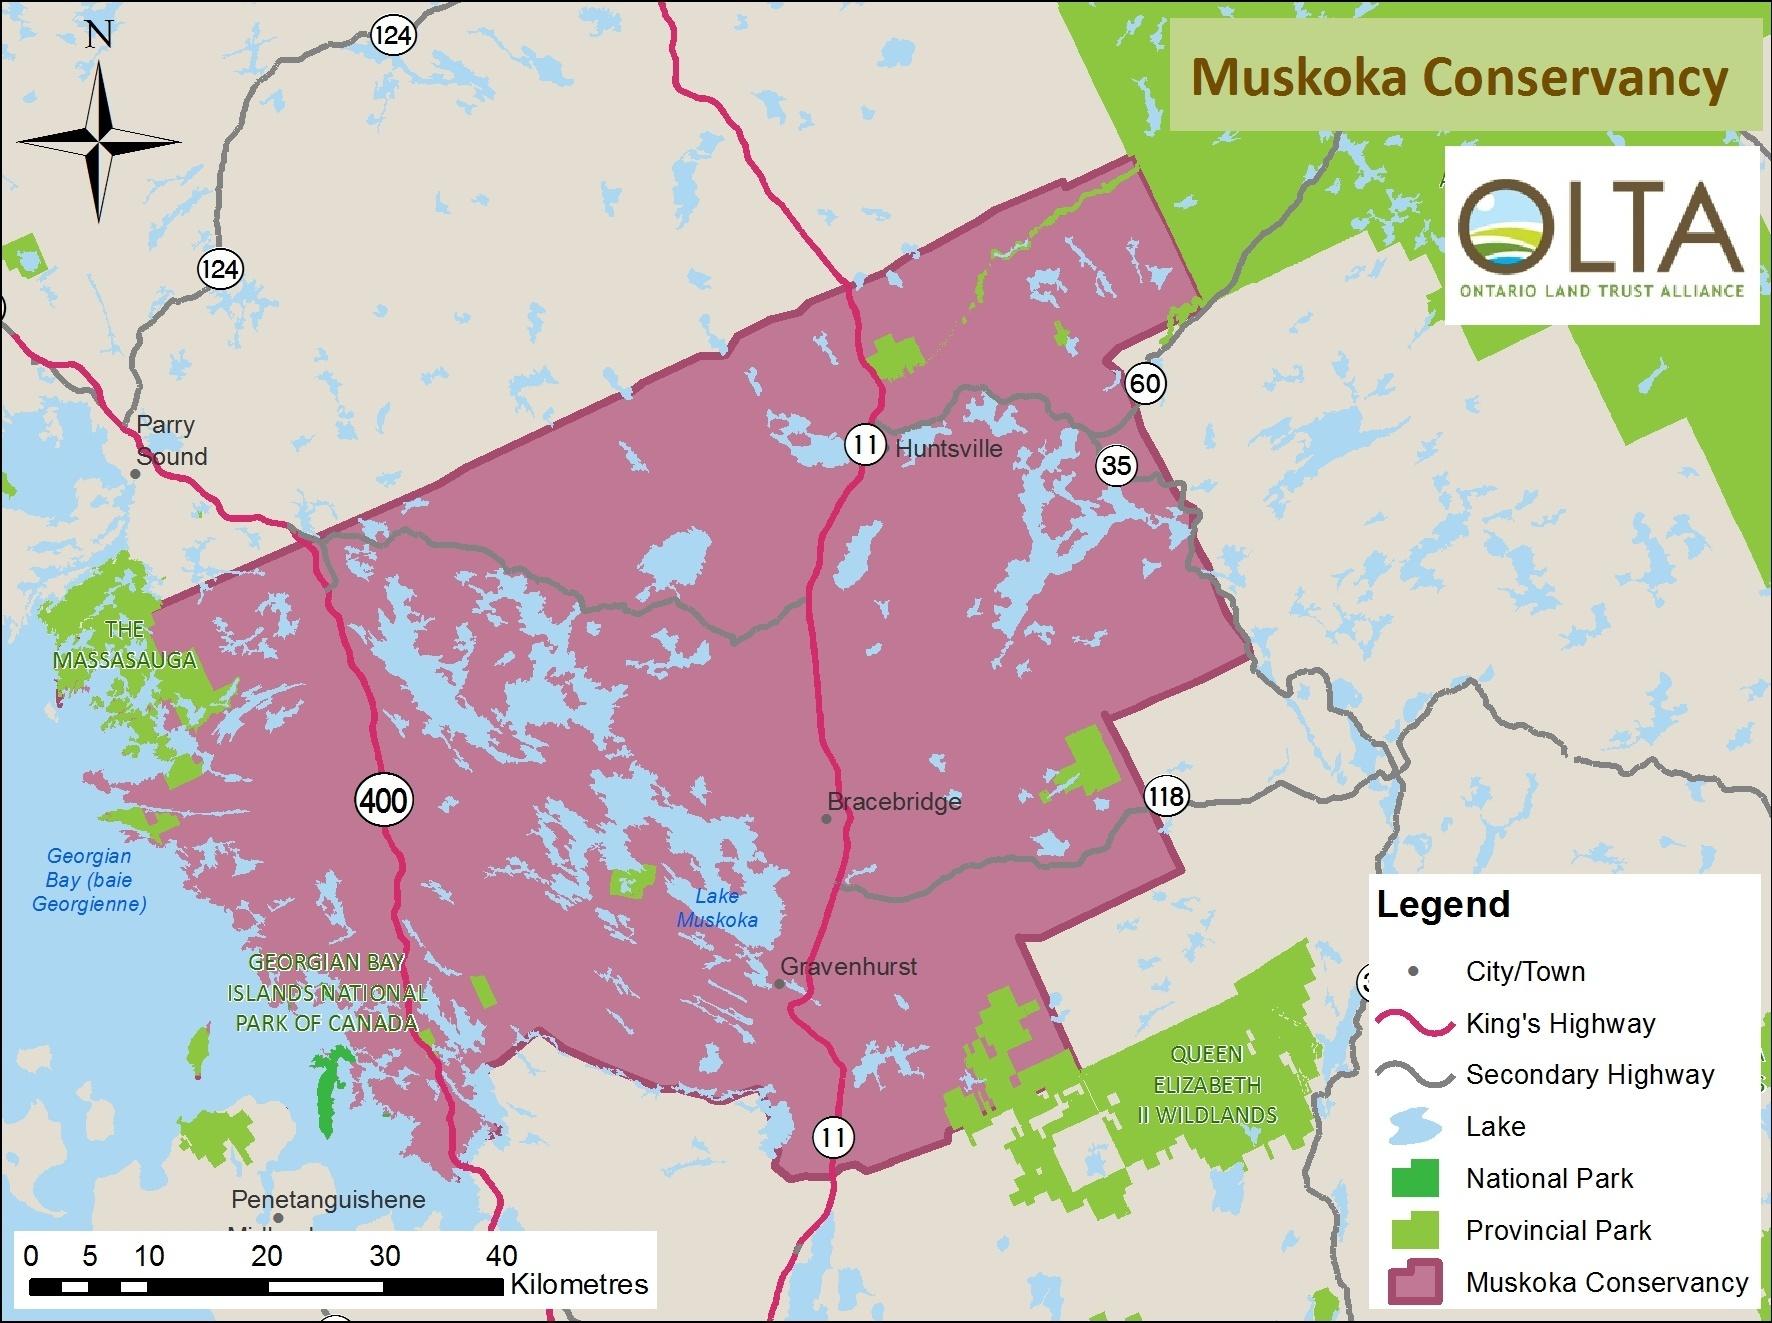 Muskoka Conservancy area of operations map